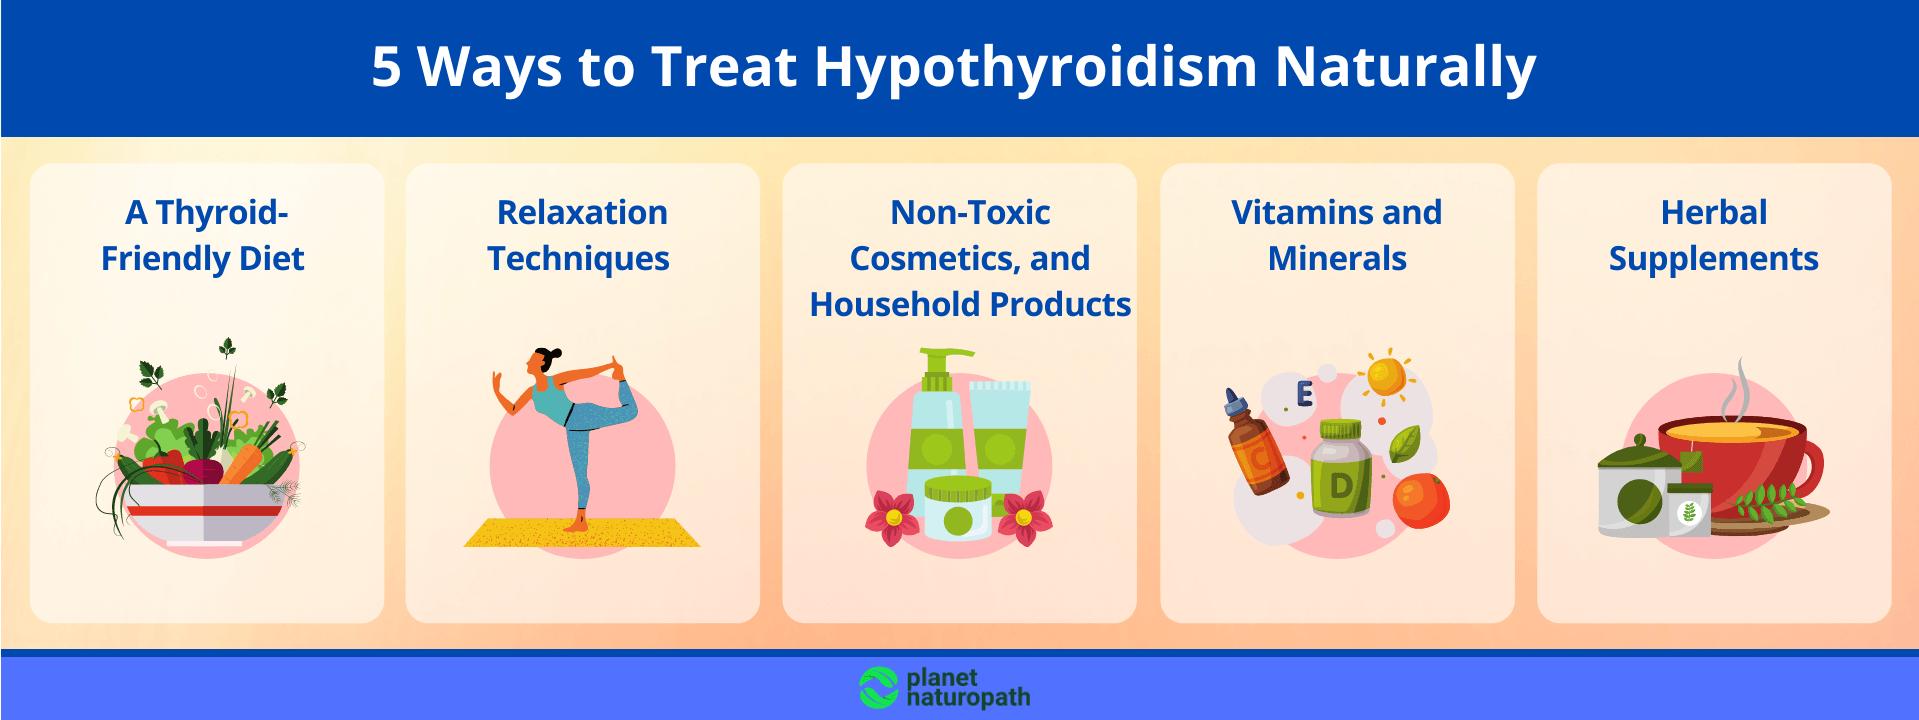 5 Ways to Treat Hypothyroidism Naturally